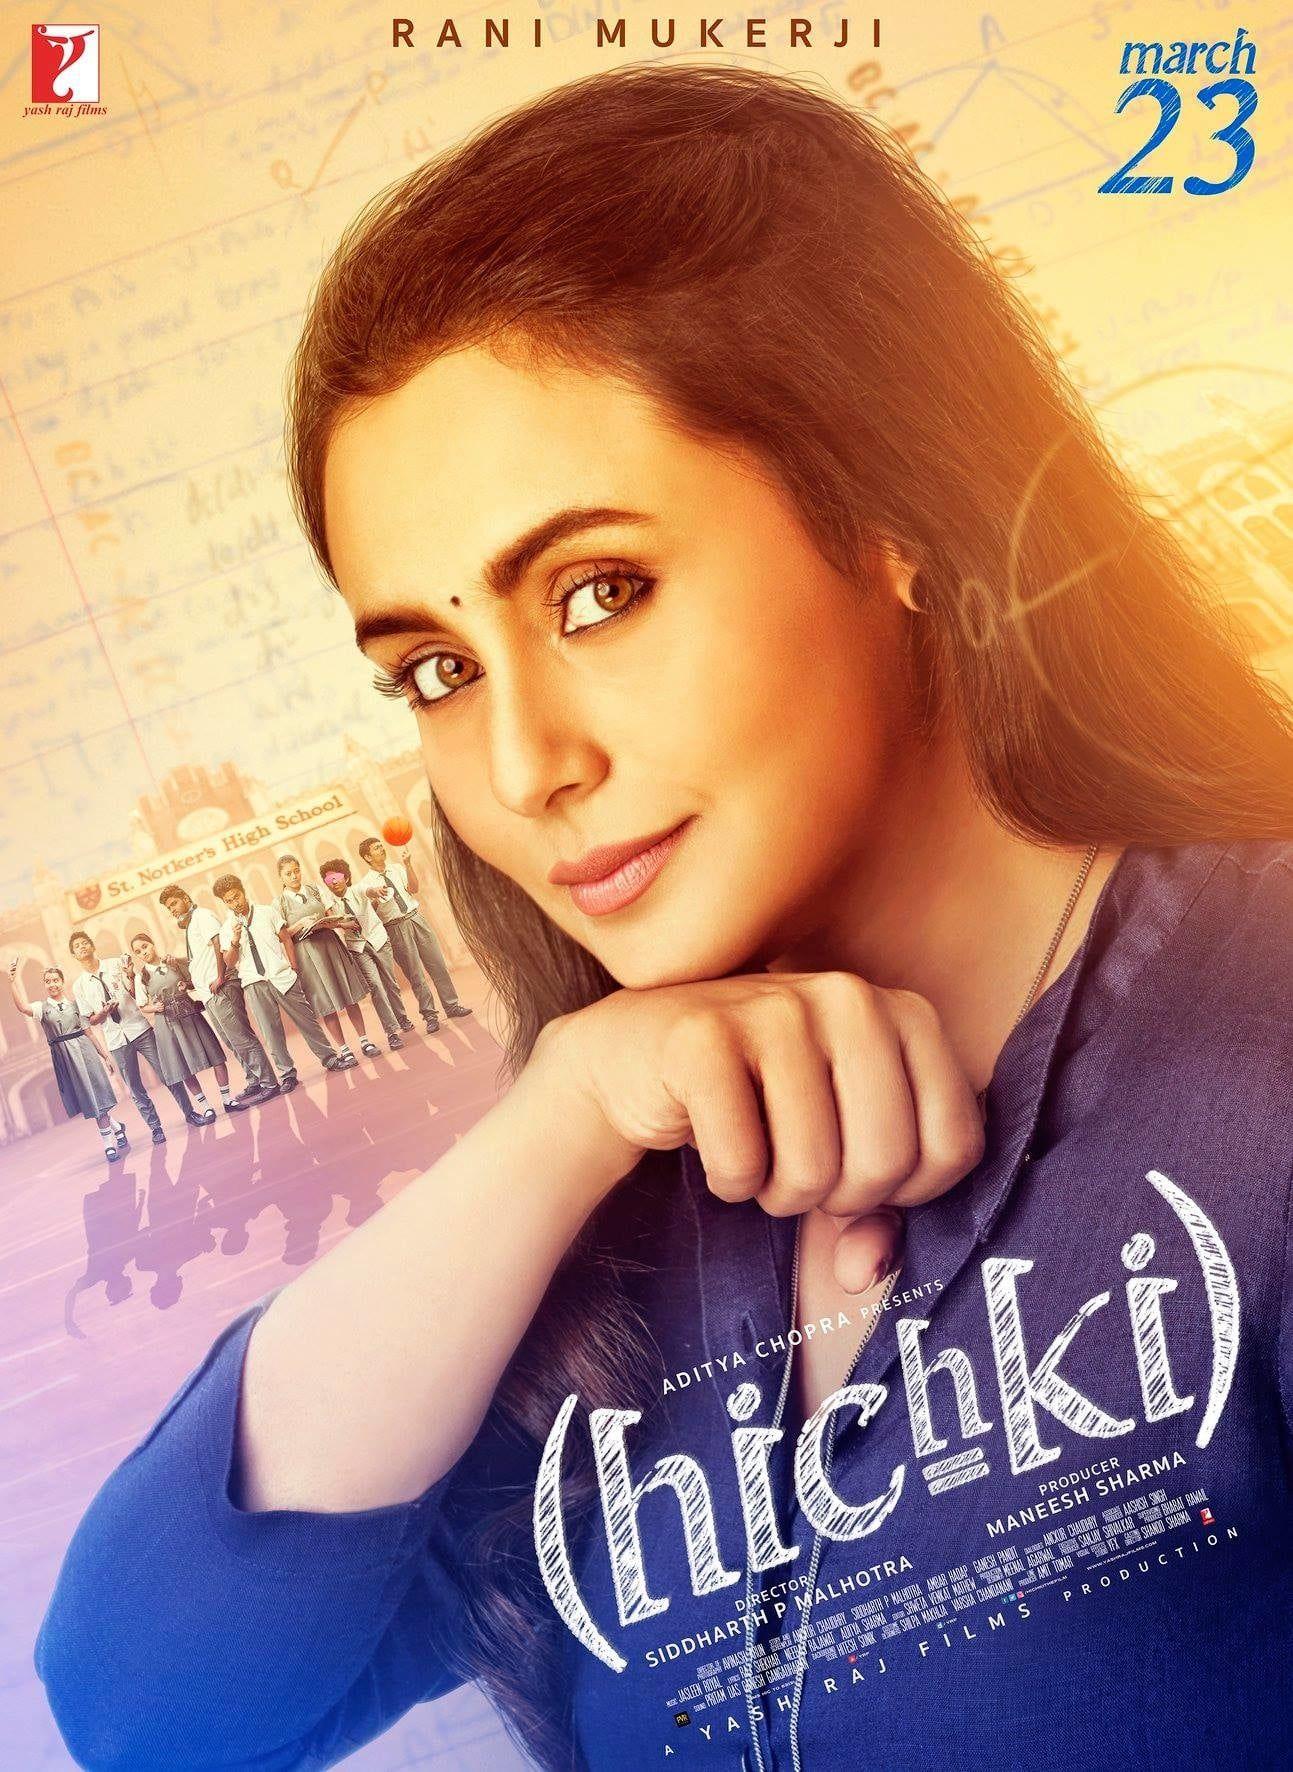 ☆√ Hichki (2018)FULL MOVIE Online Free - ENGLISH HD 720p